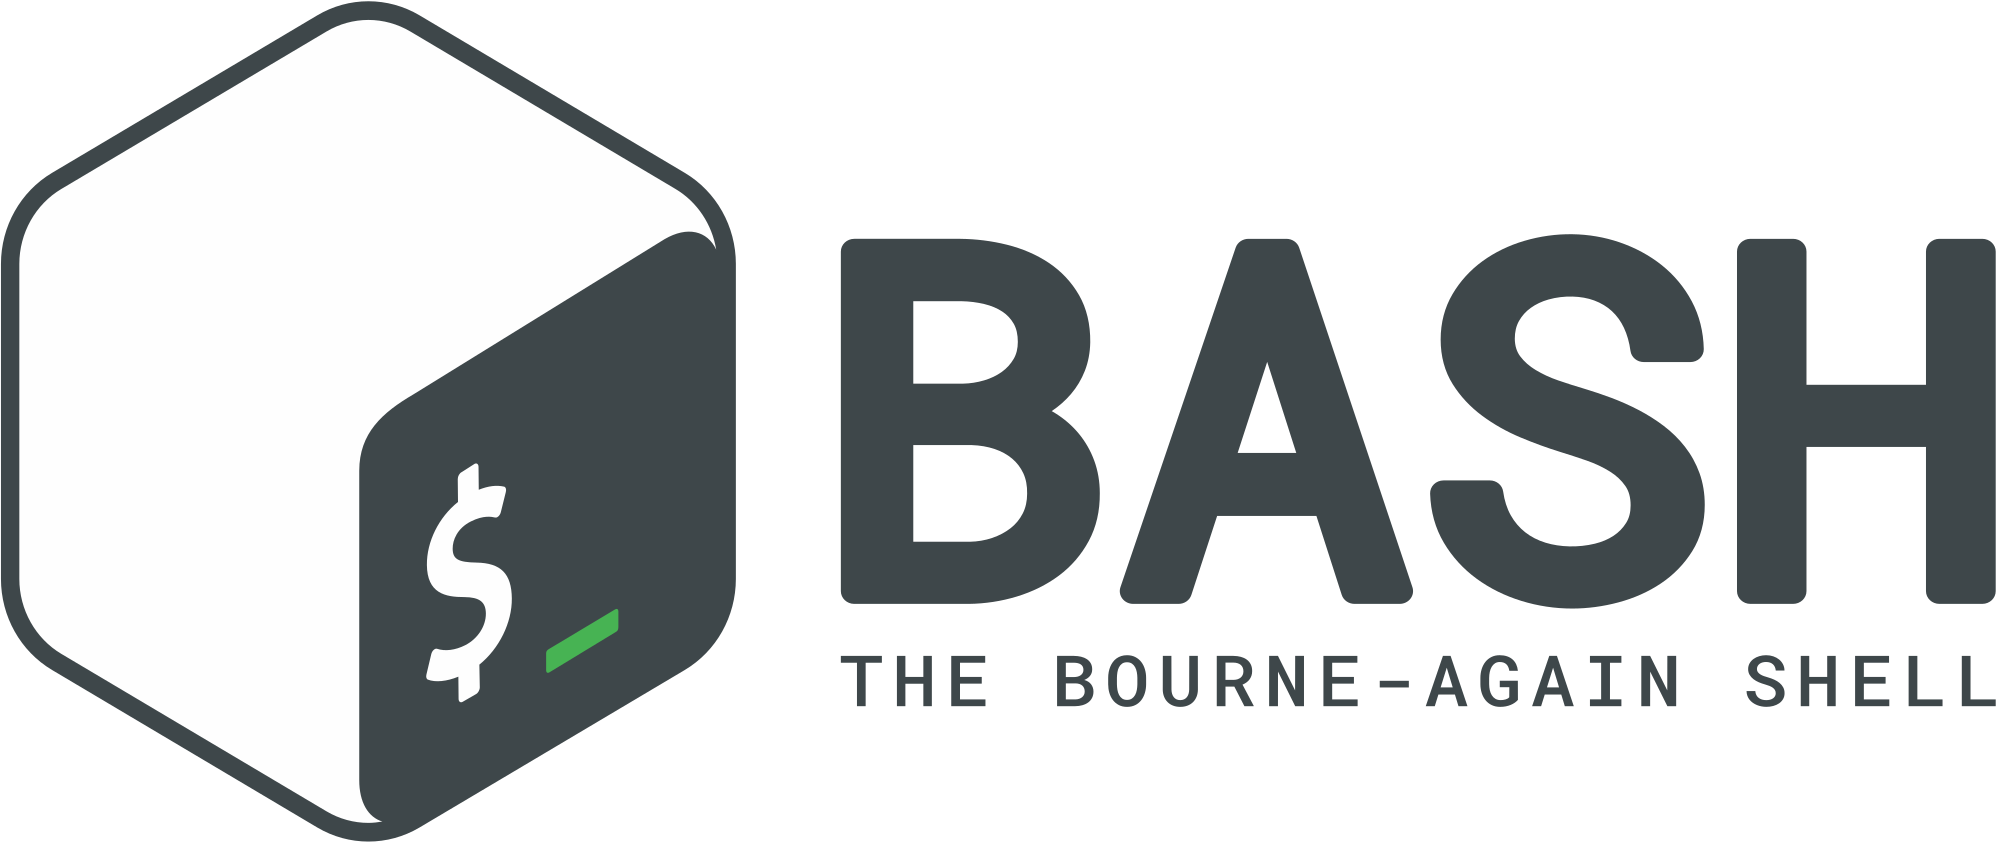 Gnu-bash-logo-fedorafans.com